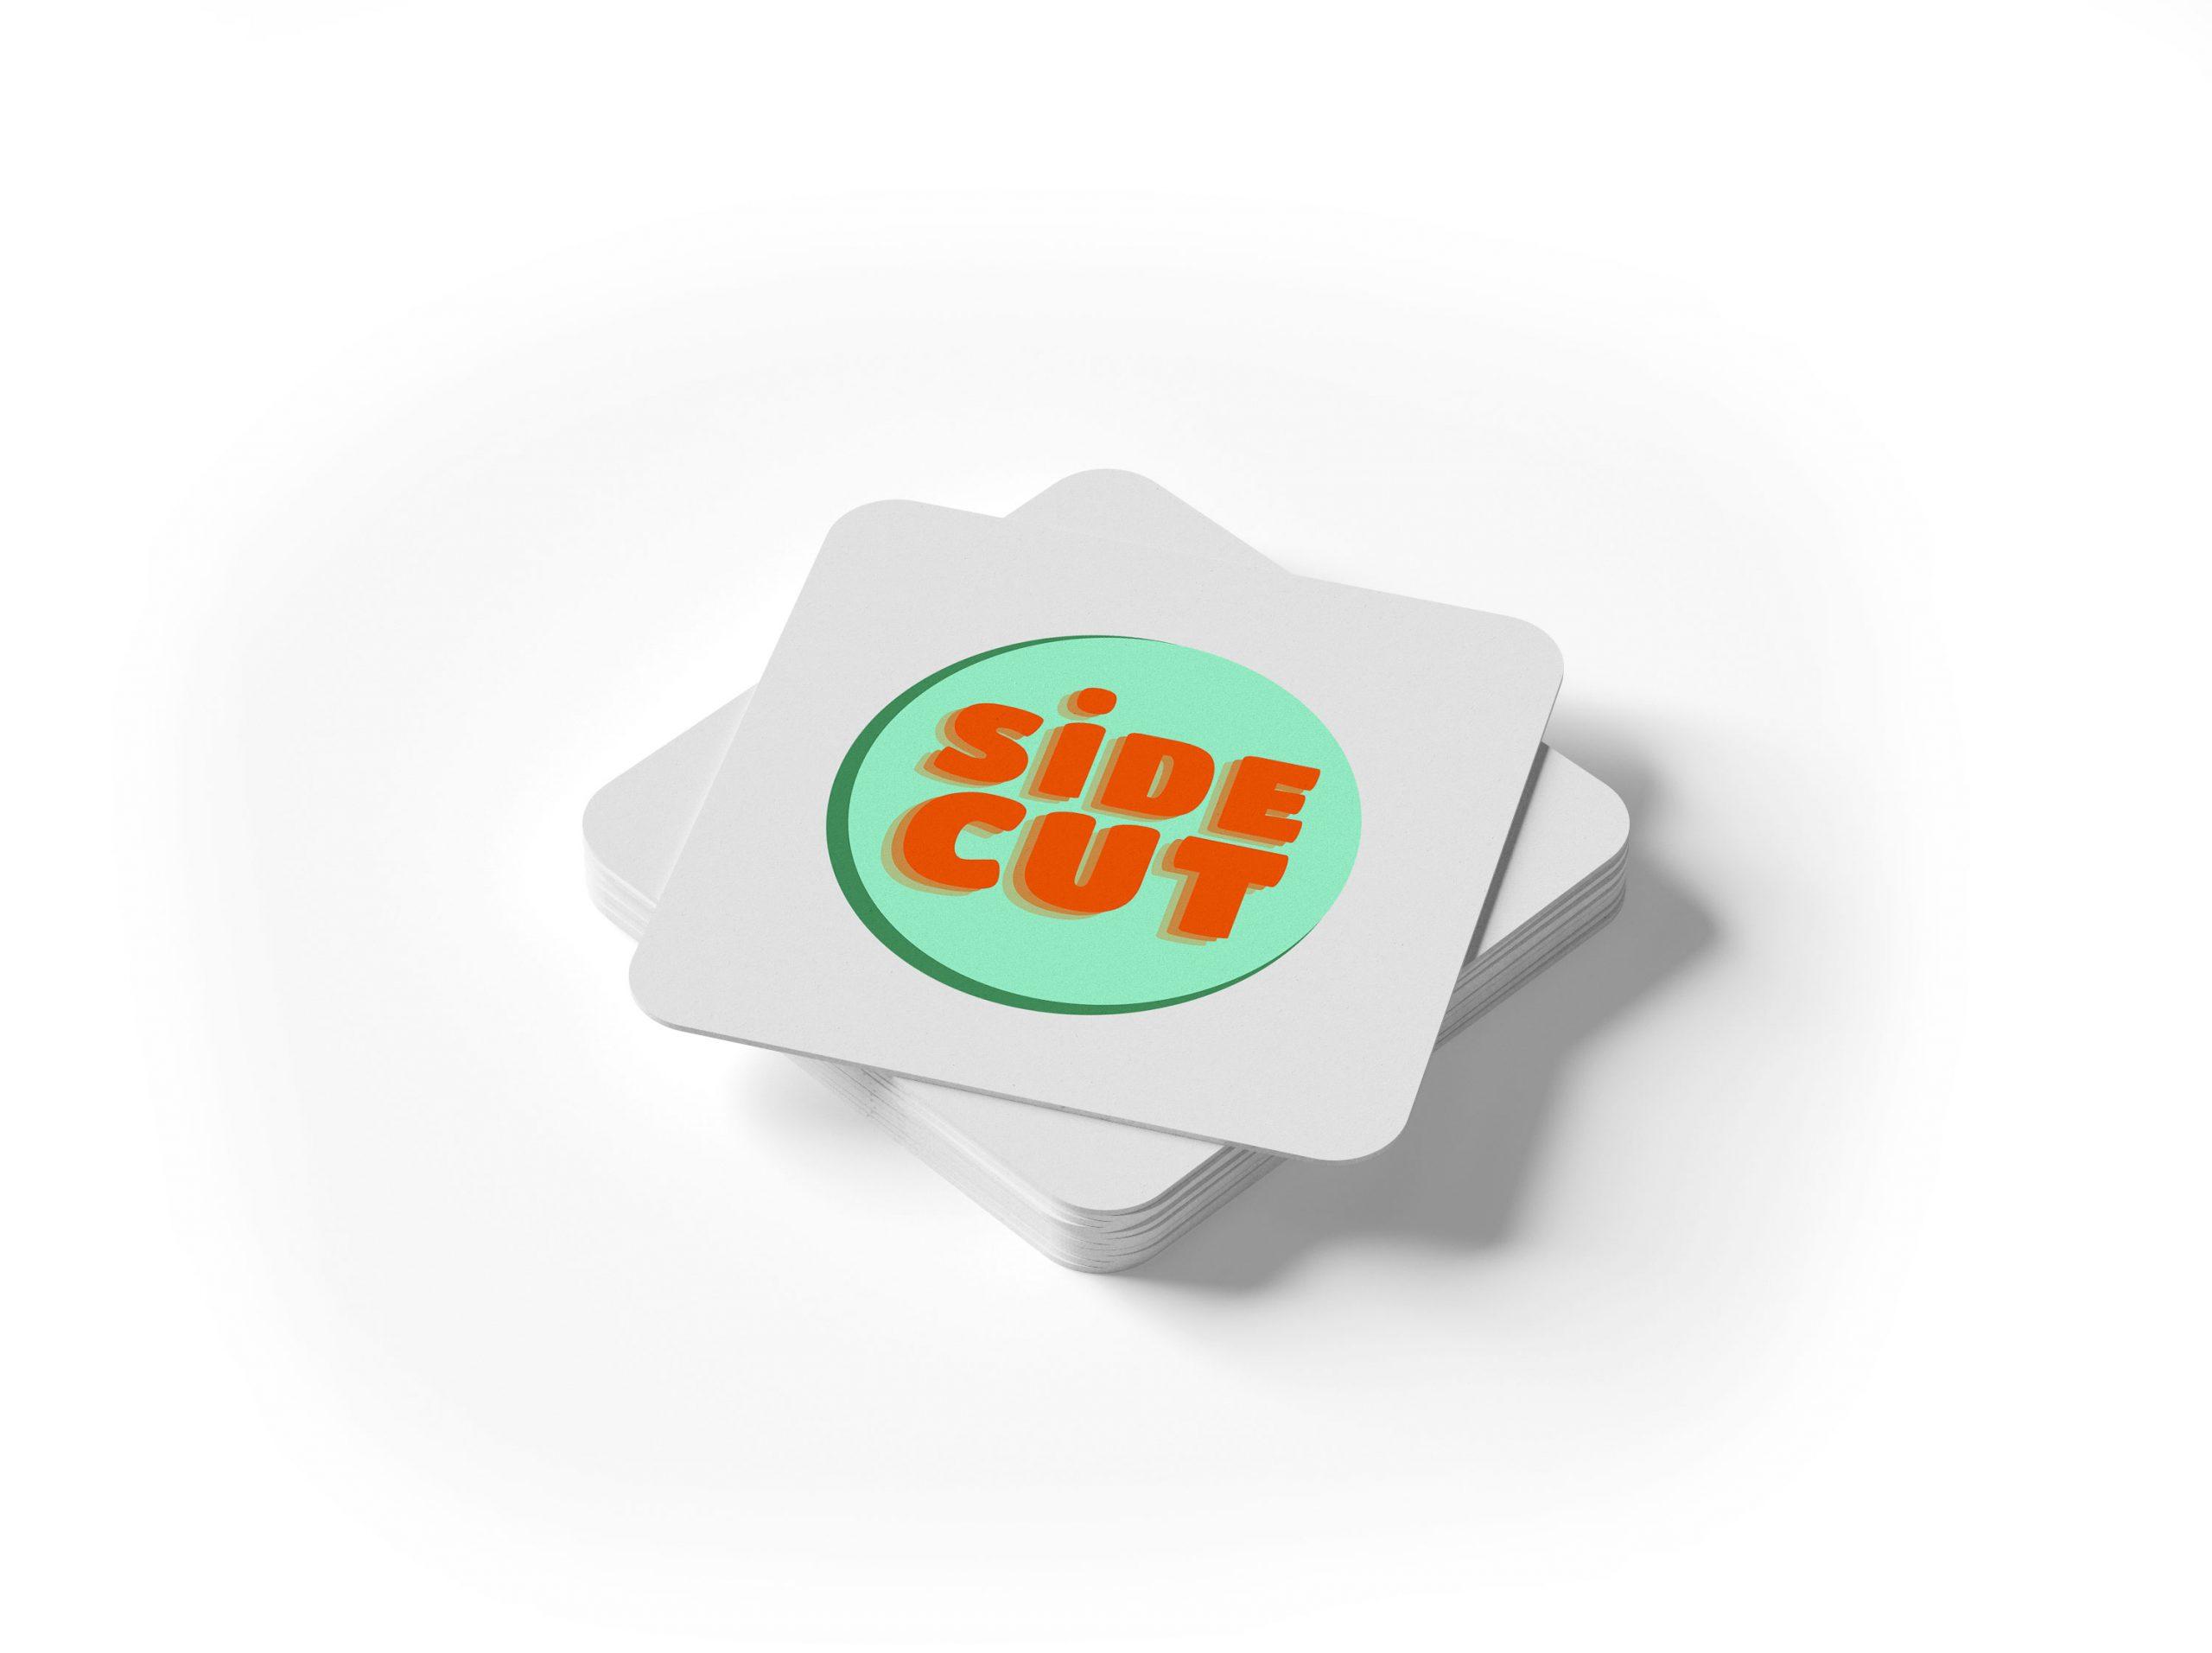 Logo Sidecut par Sophie Lobet